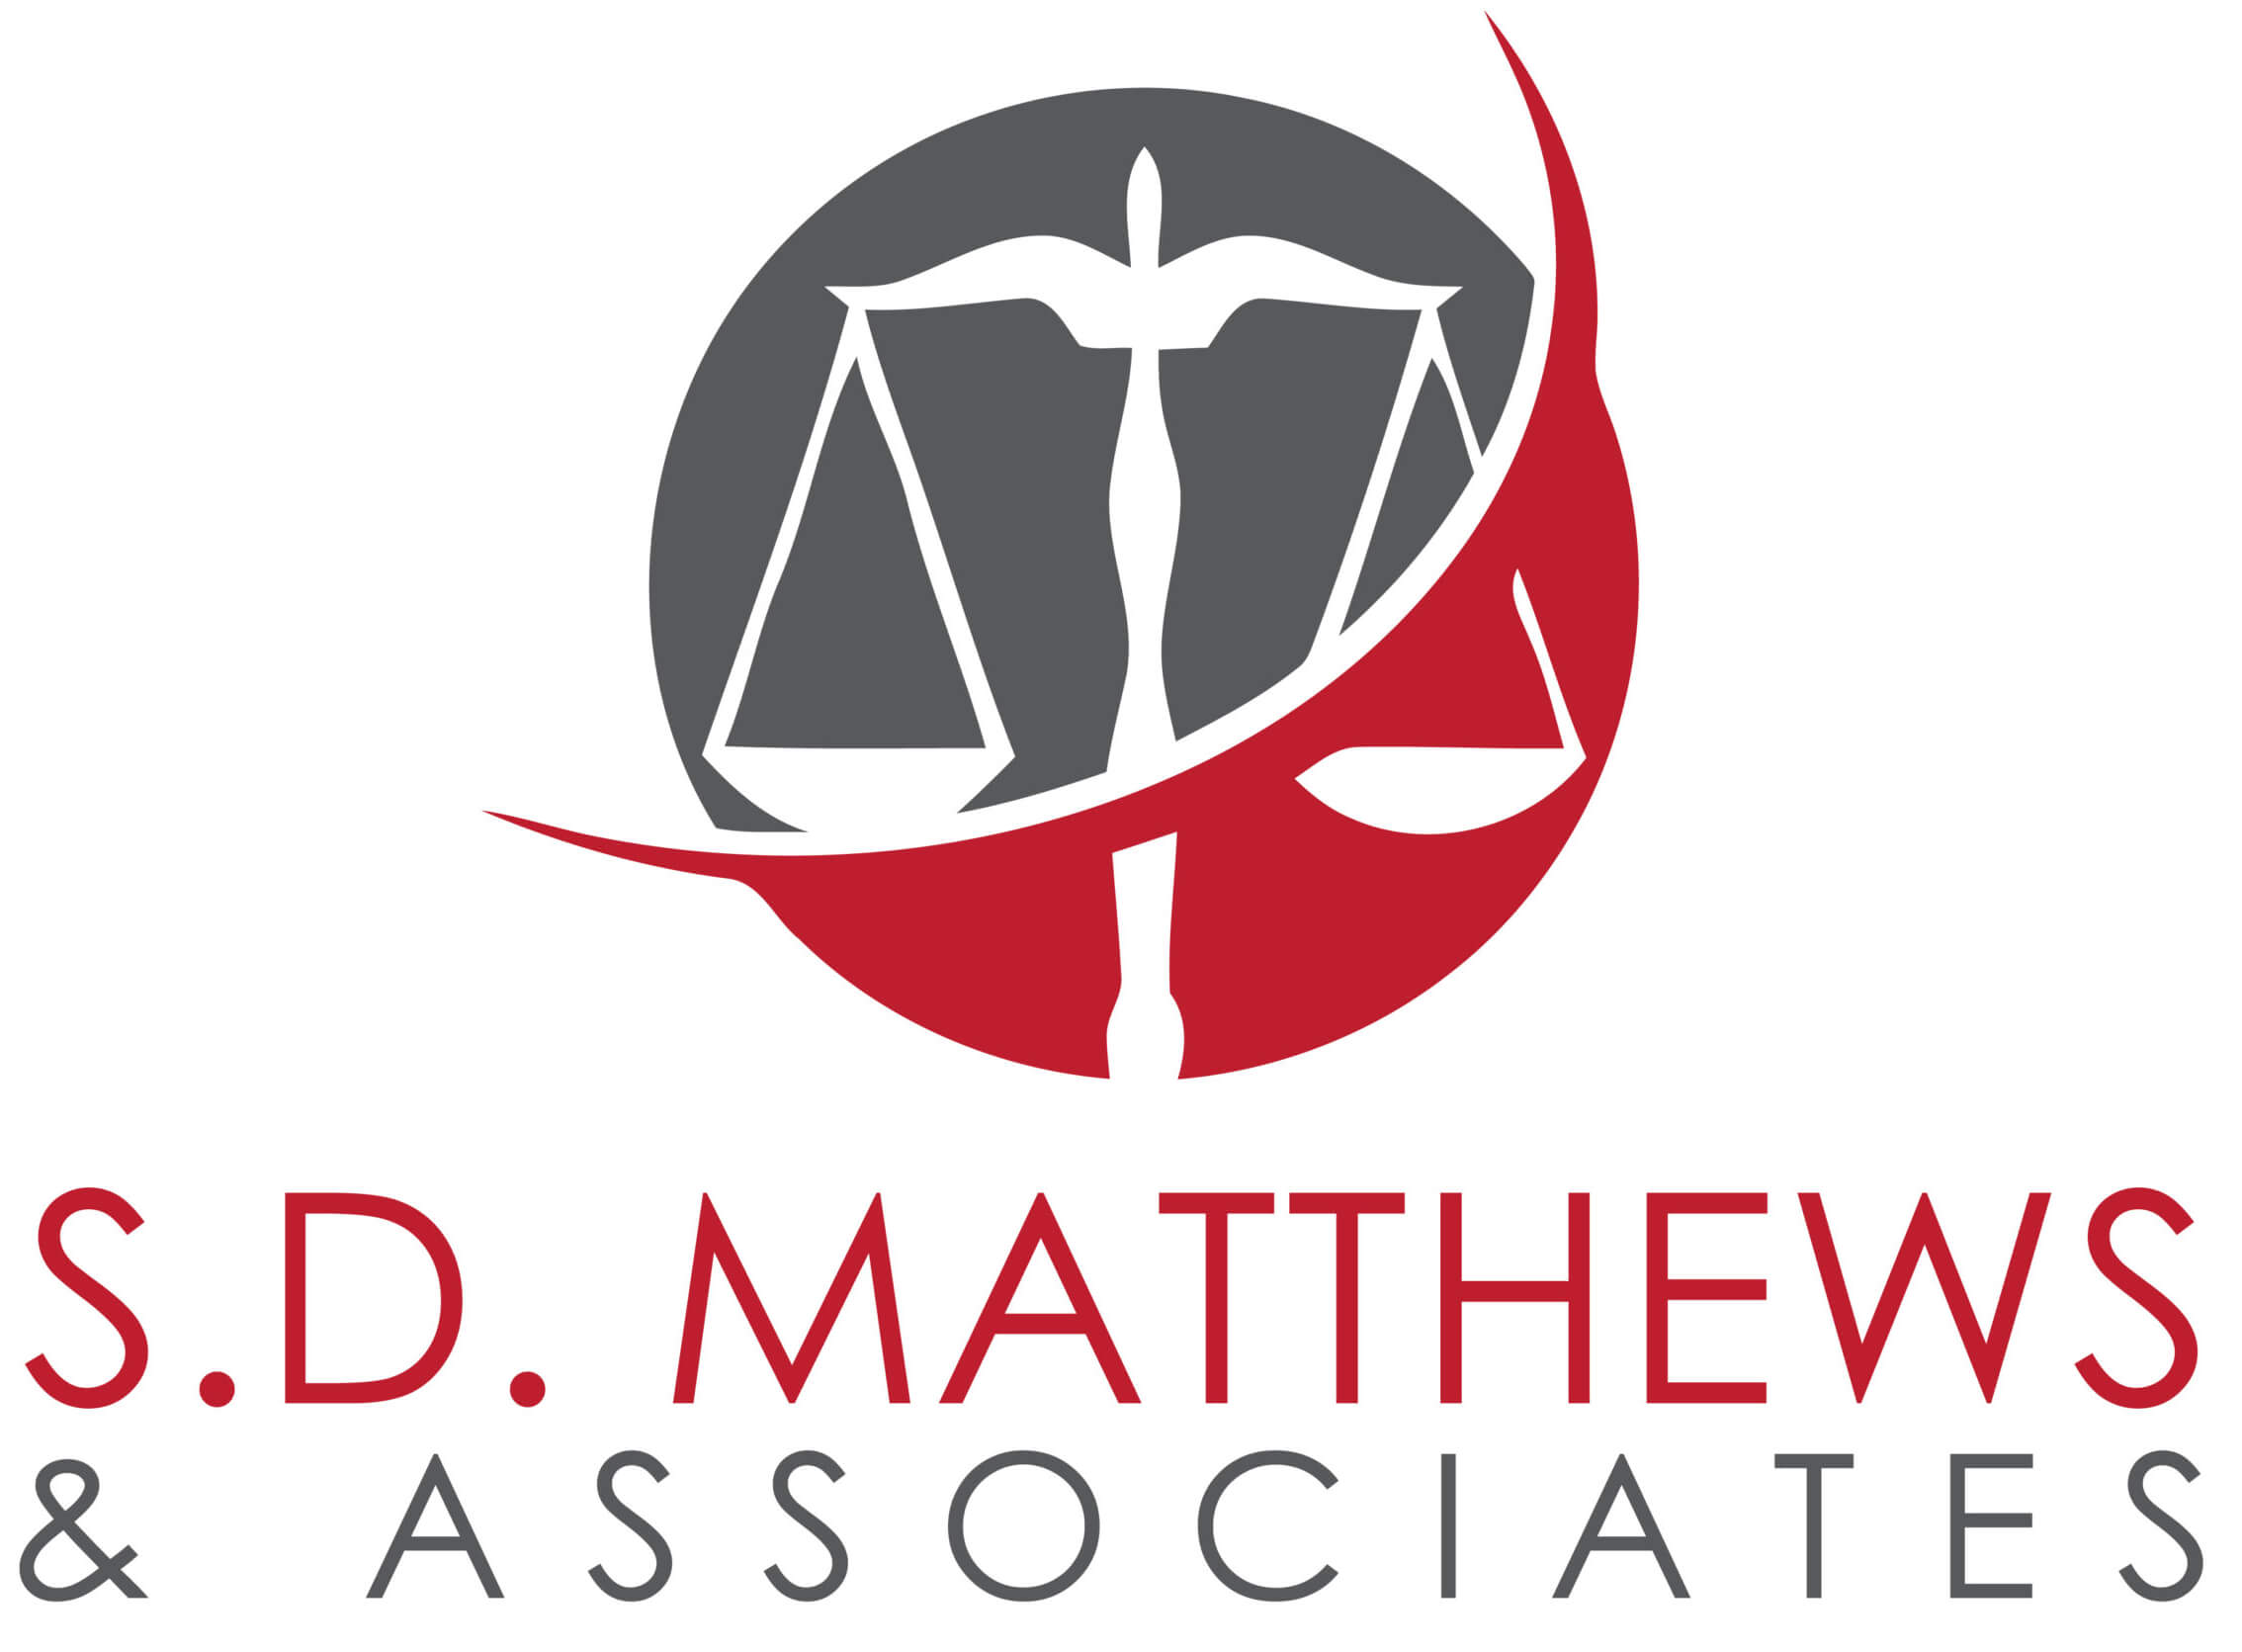 S.D. Matthews & Associates, PLLC